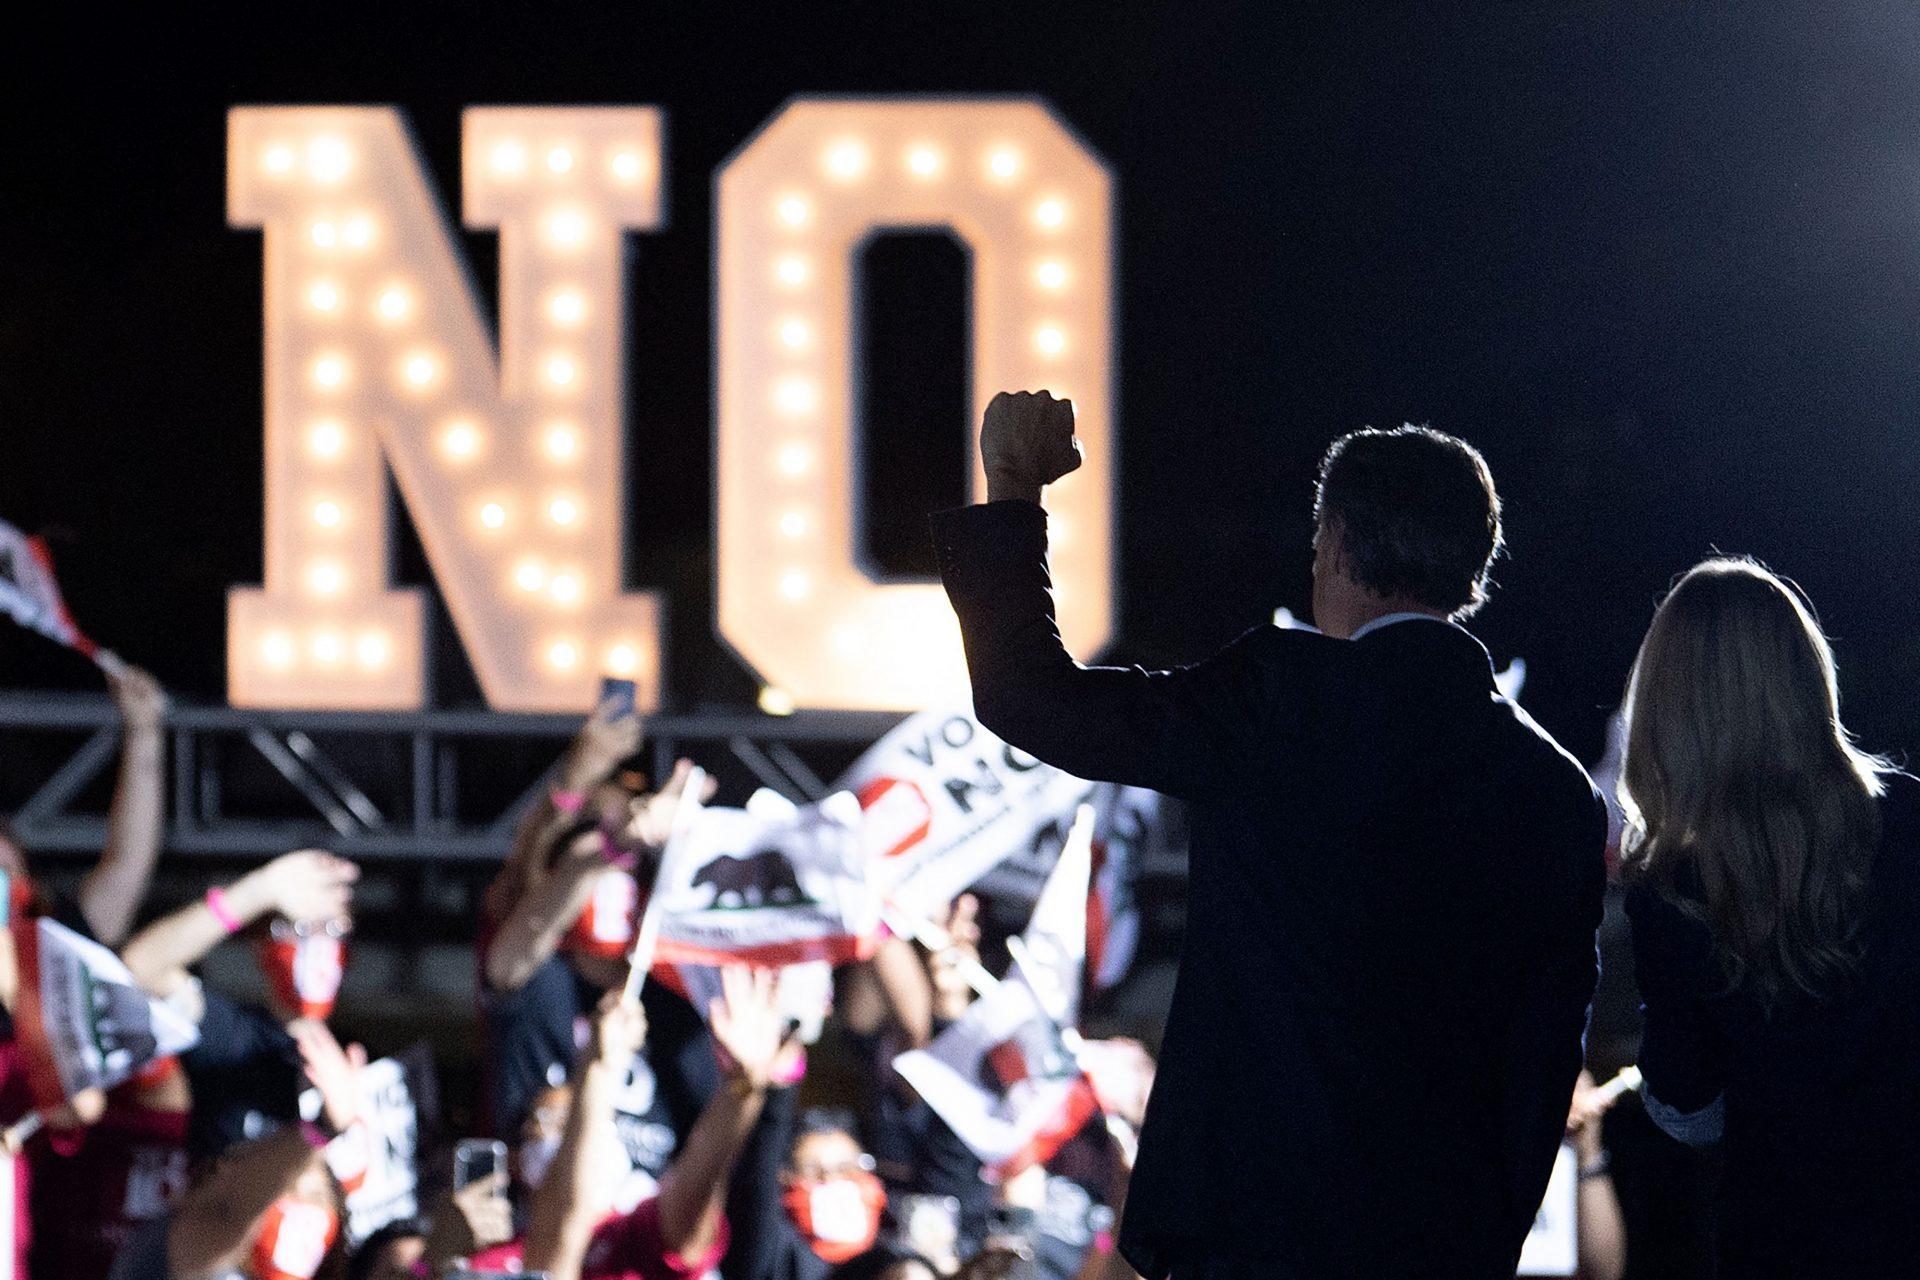 California governor Gavin Newsom at an anti-recall event in Long Beach, California. Photo: Brendan Smialowski/AFP via Getty Images.